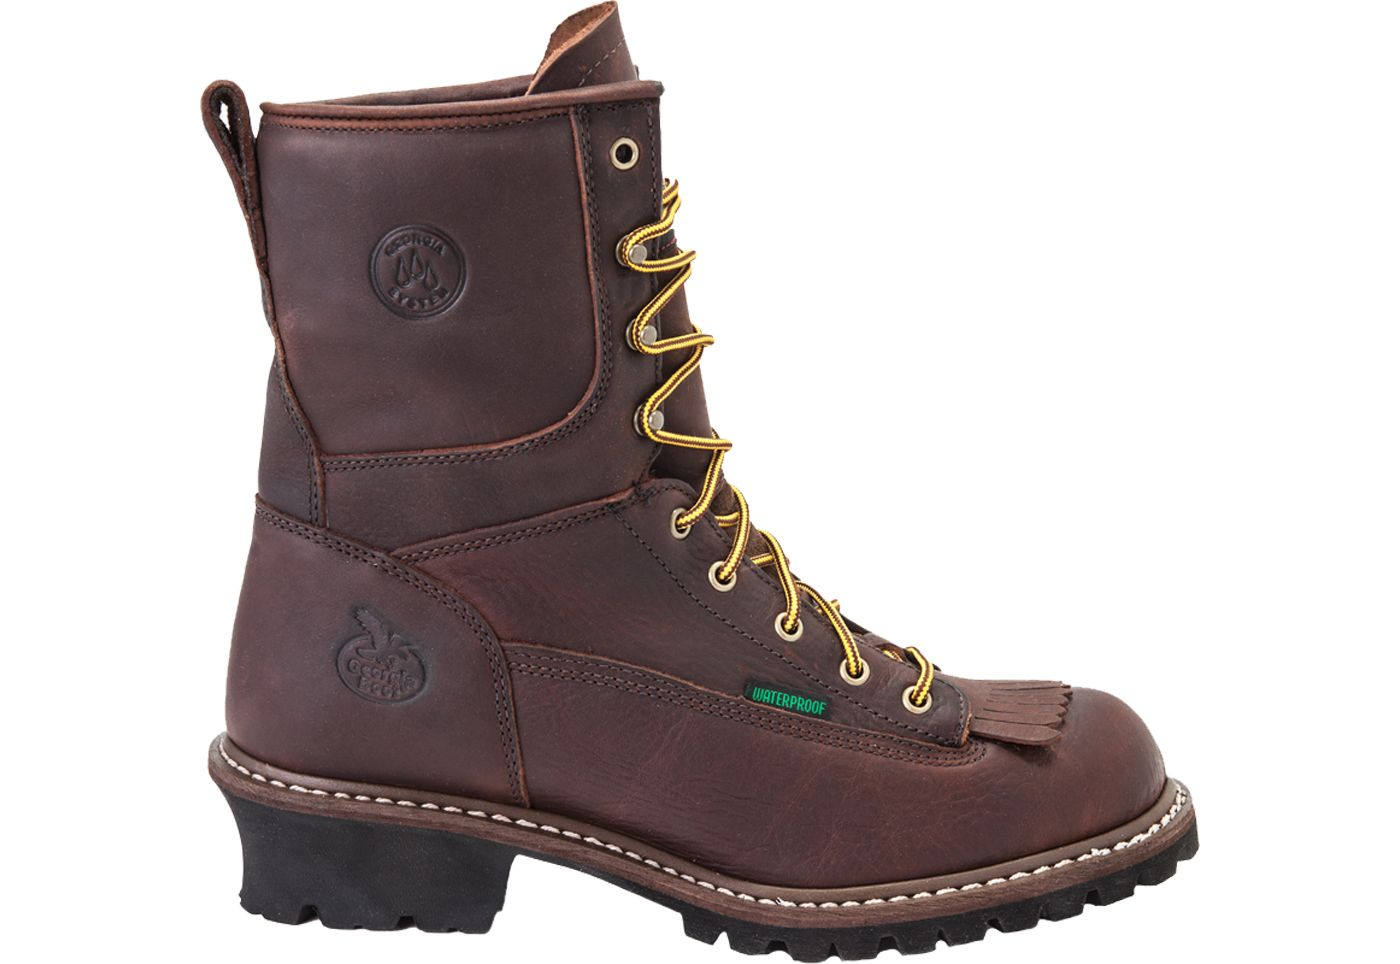 Georgia Boot Men's Logger Waterproof 8'' Steel Toe Work Boots